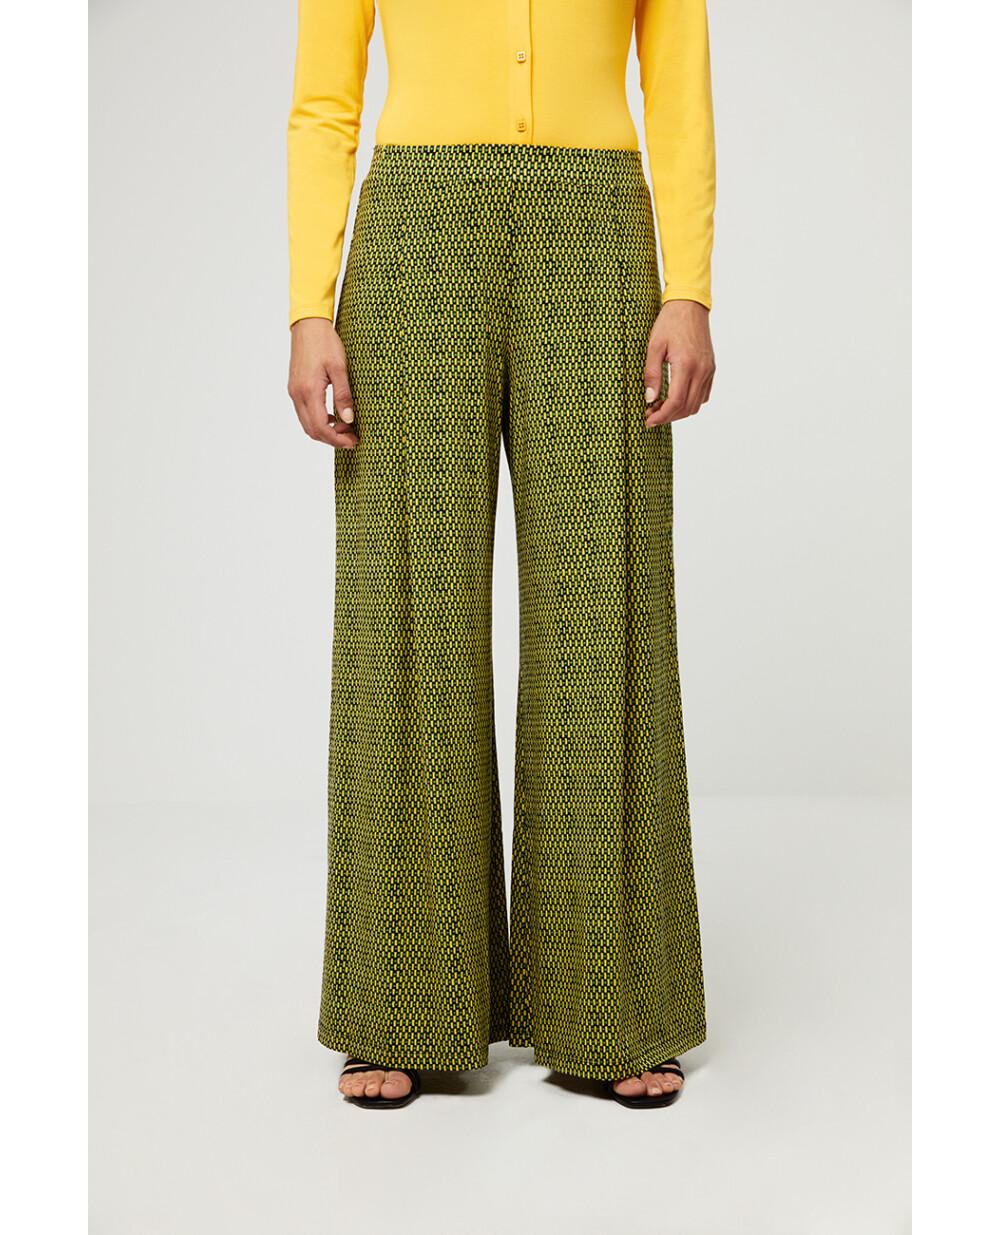 Surkana pantalone microfantasia verde